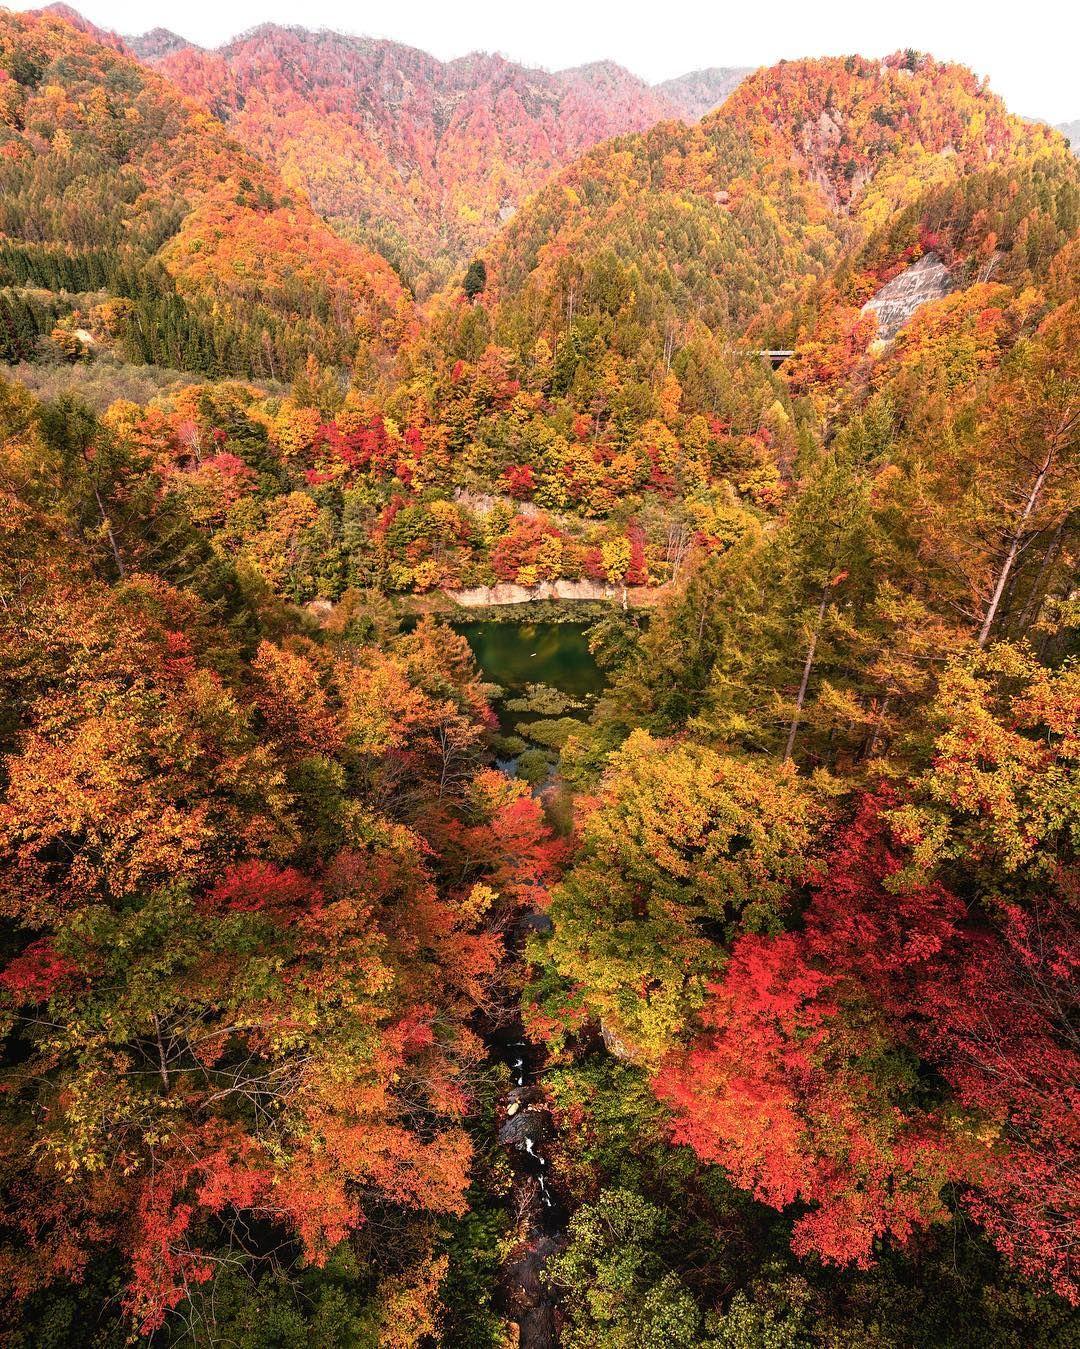 Colorful Autumn In Japan Landscape Photography By Daisuke Uematsu Beautiful Photography Nature Fall Photography Nature Landscape Photography